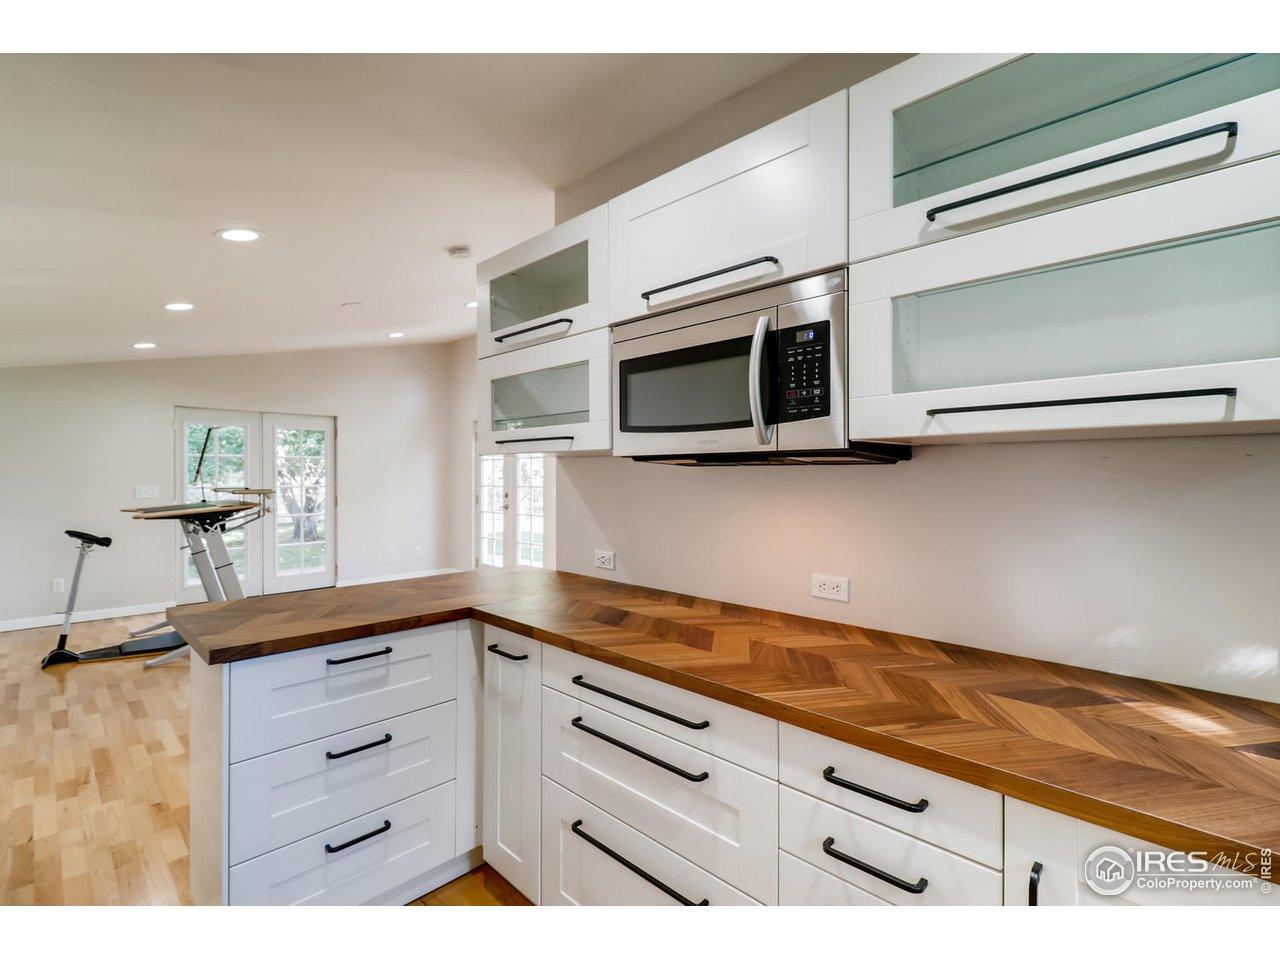 Backyard studio kitchenette